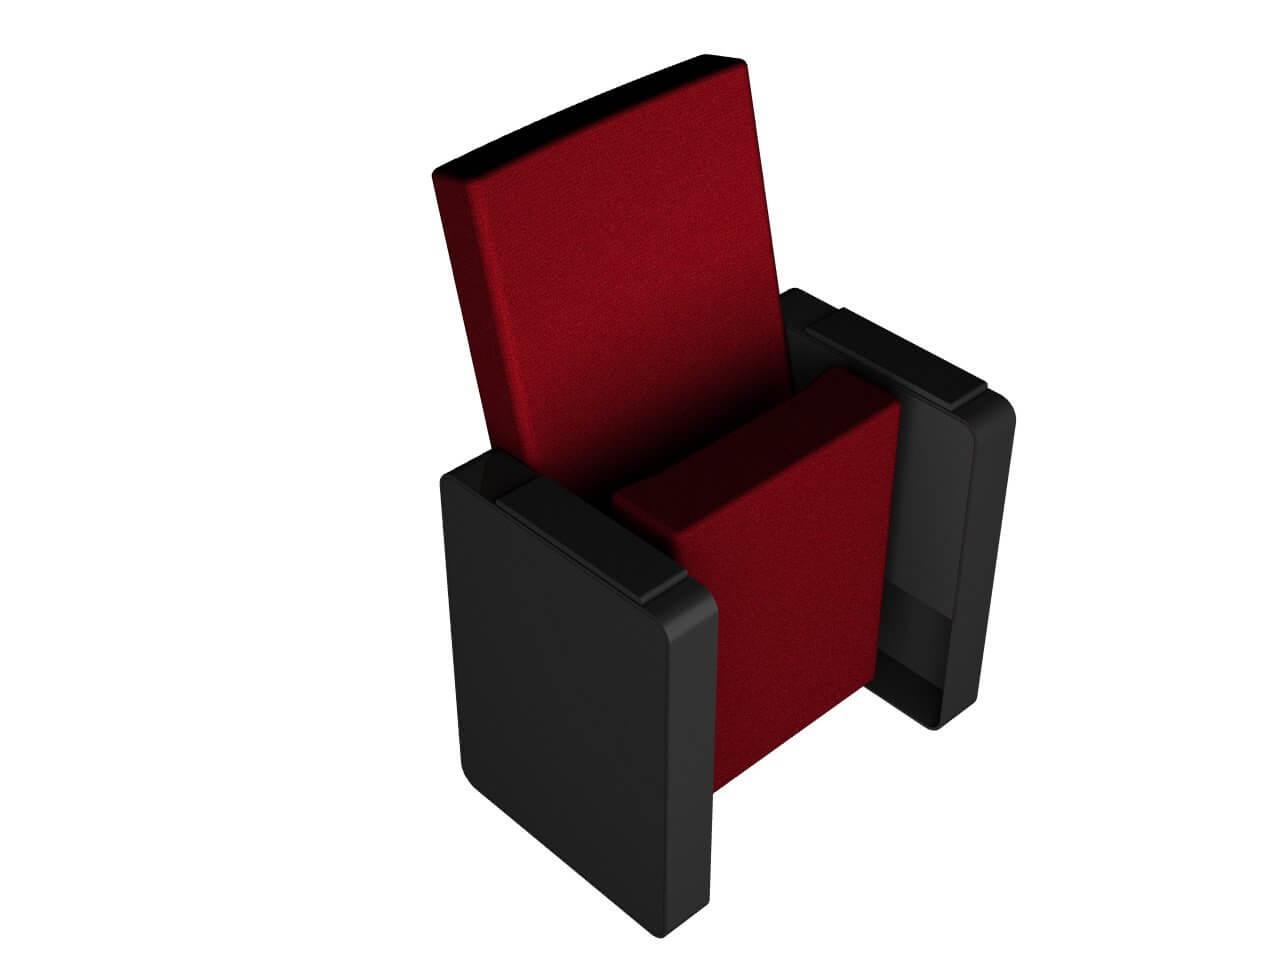 Kleslo - KORIPHEE- Leader de fabrication de fauteuils cinéma, théâtre ...Koryphée V3